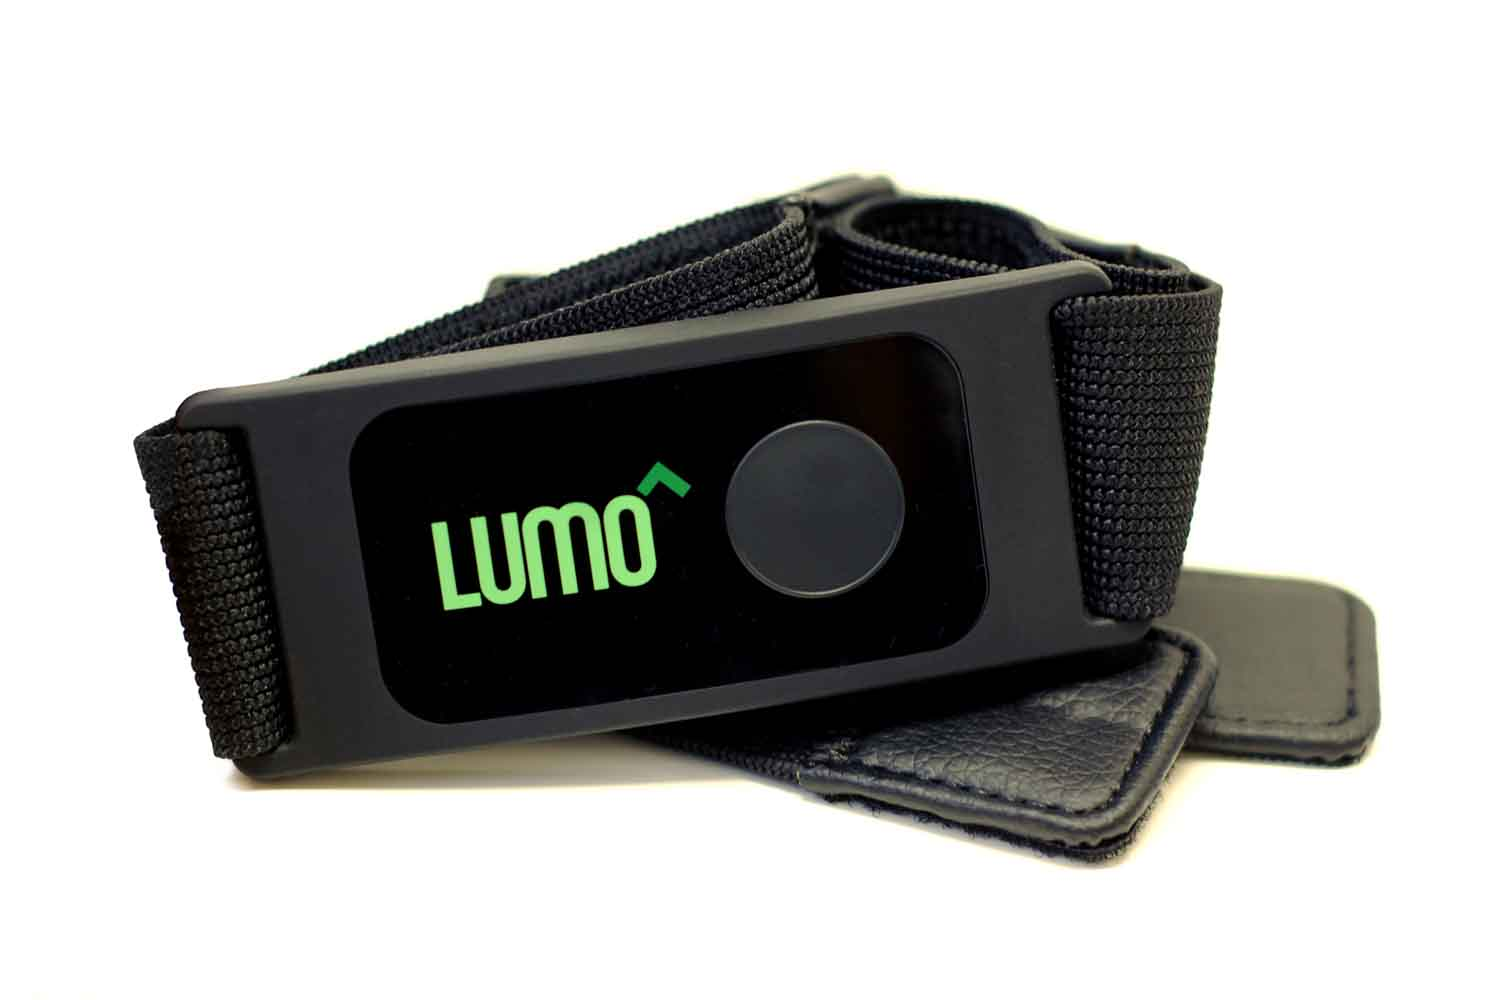 LUMOBack posture sensor